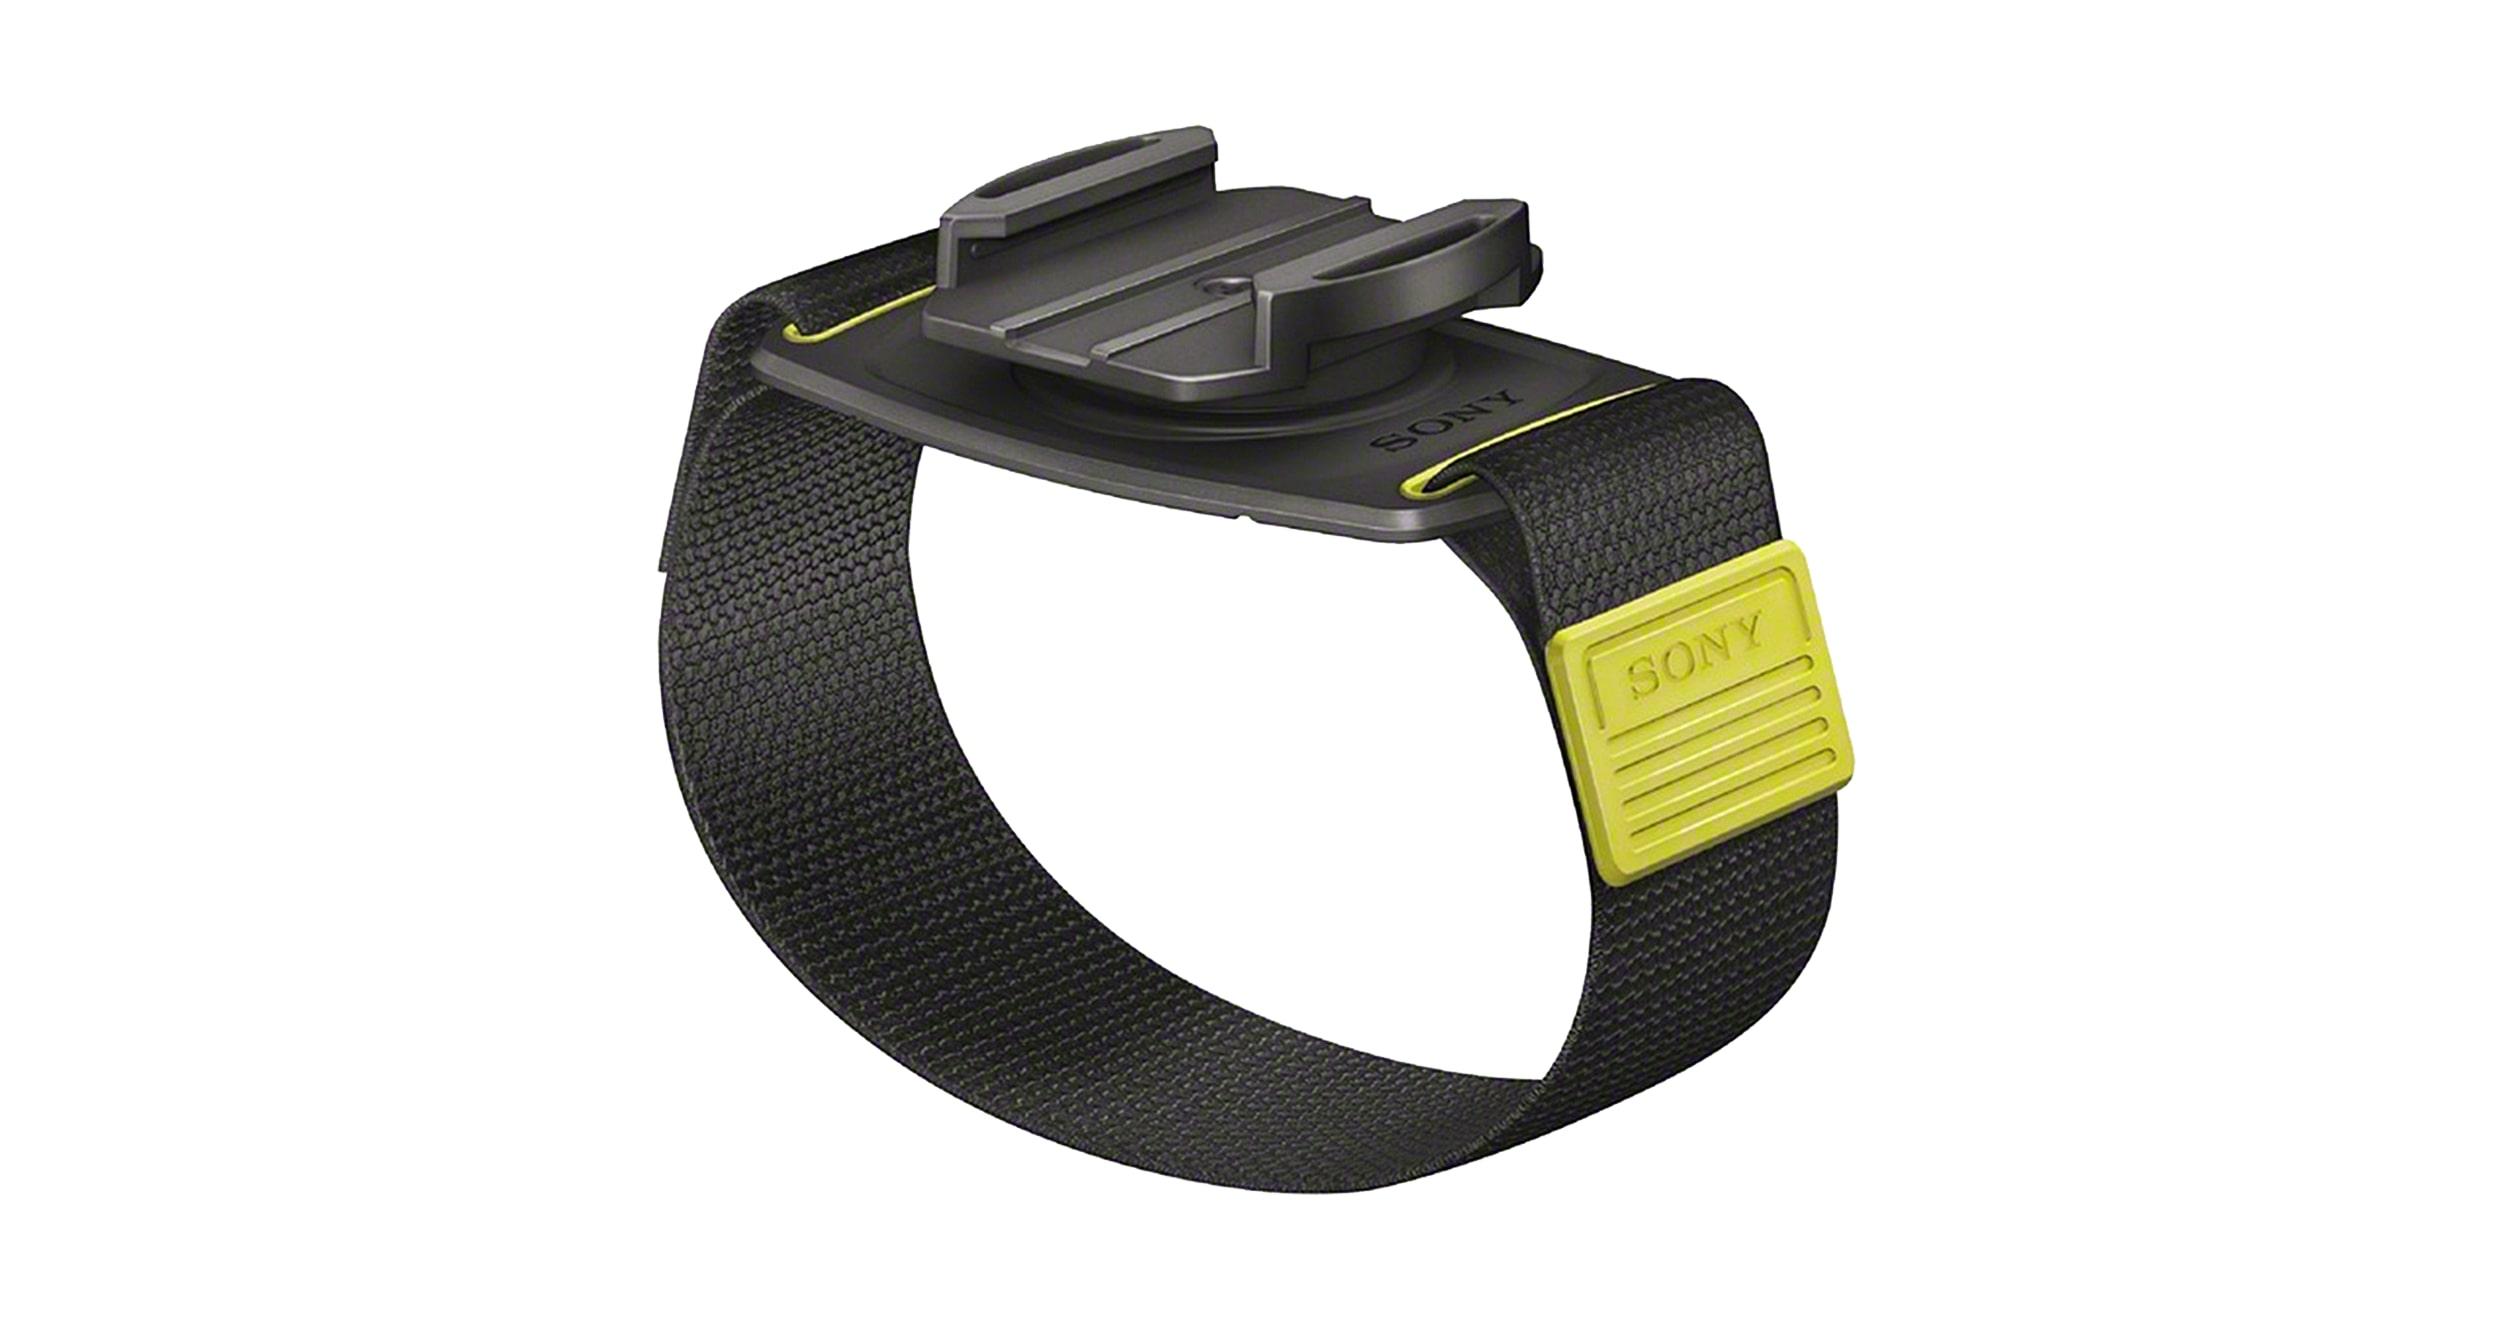 Black Sony AKAWM1 Action Cam Wrist Strap